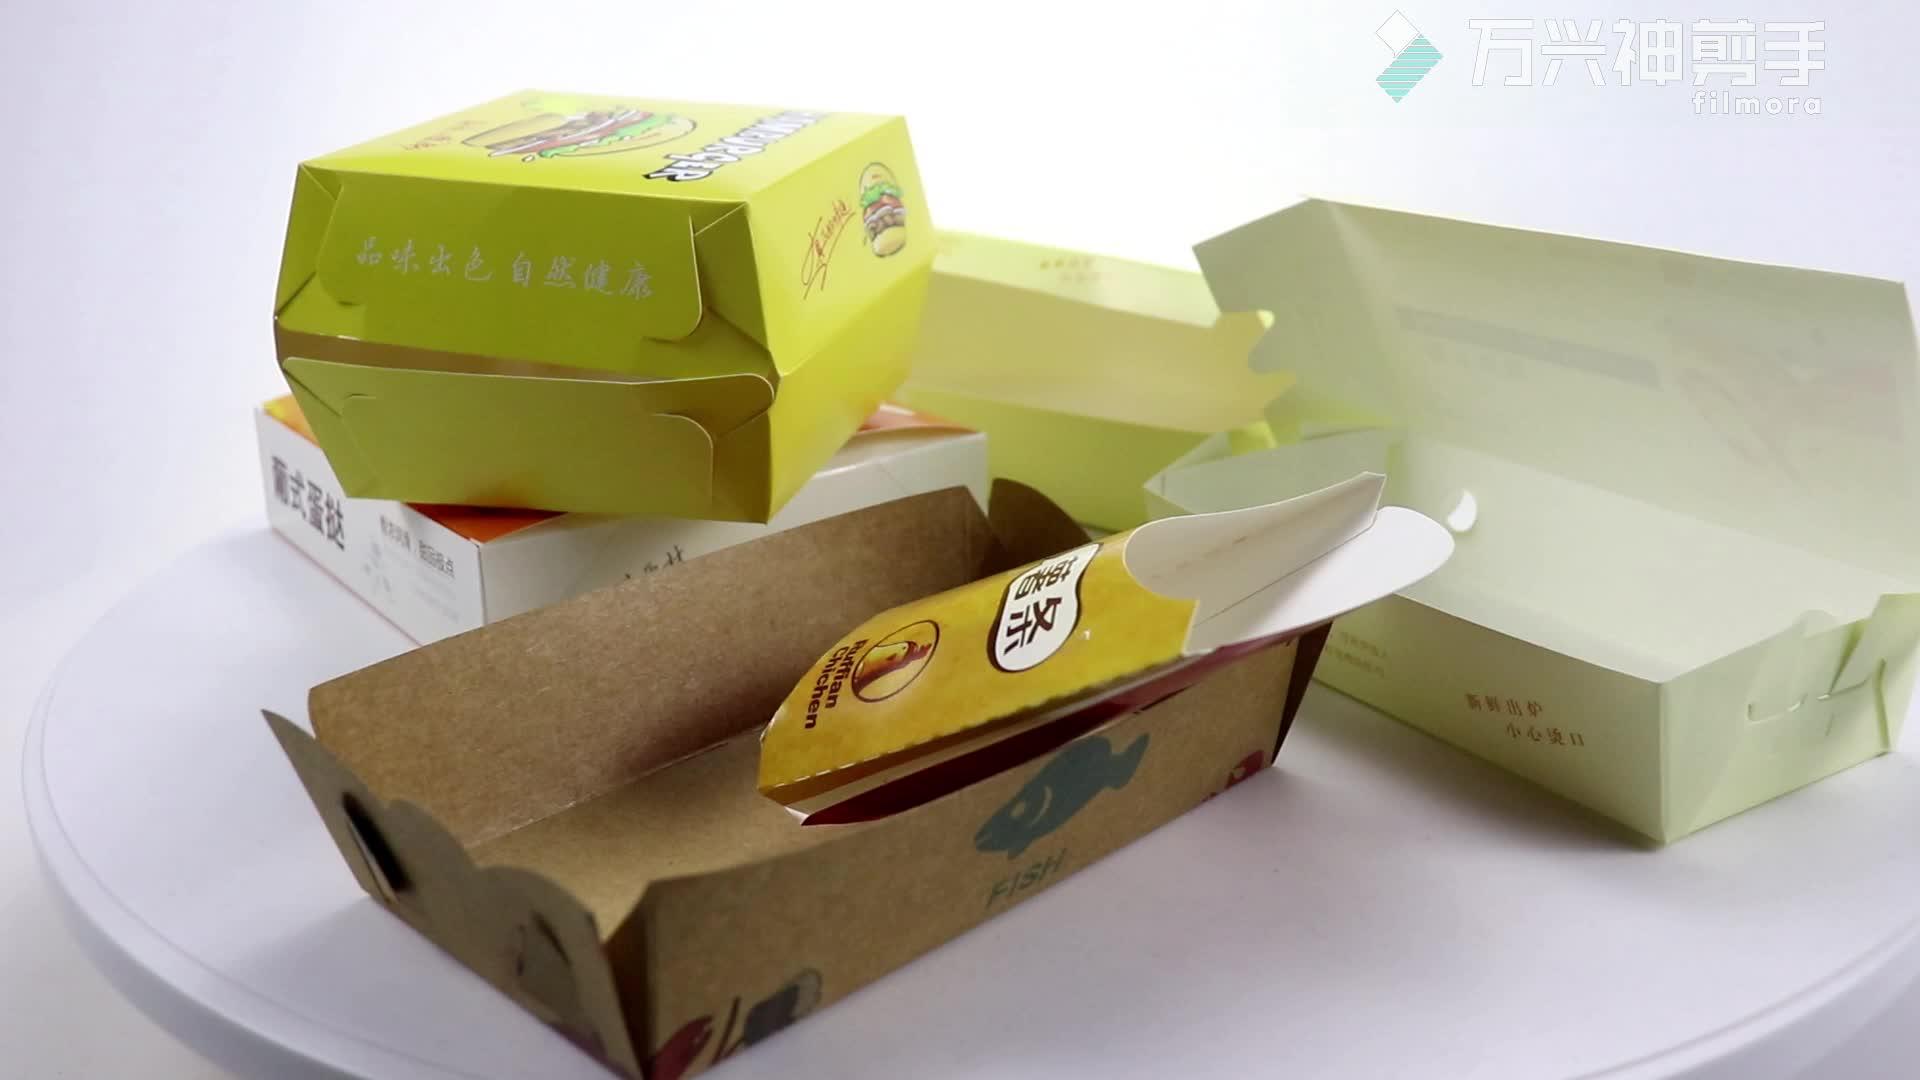 Kustom Grosir Dicetak Panas Cepat Pemesanan Makanan Panggang Ayam Goreng Kemasan Kotak Kertas